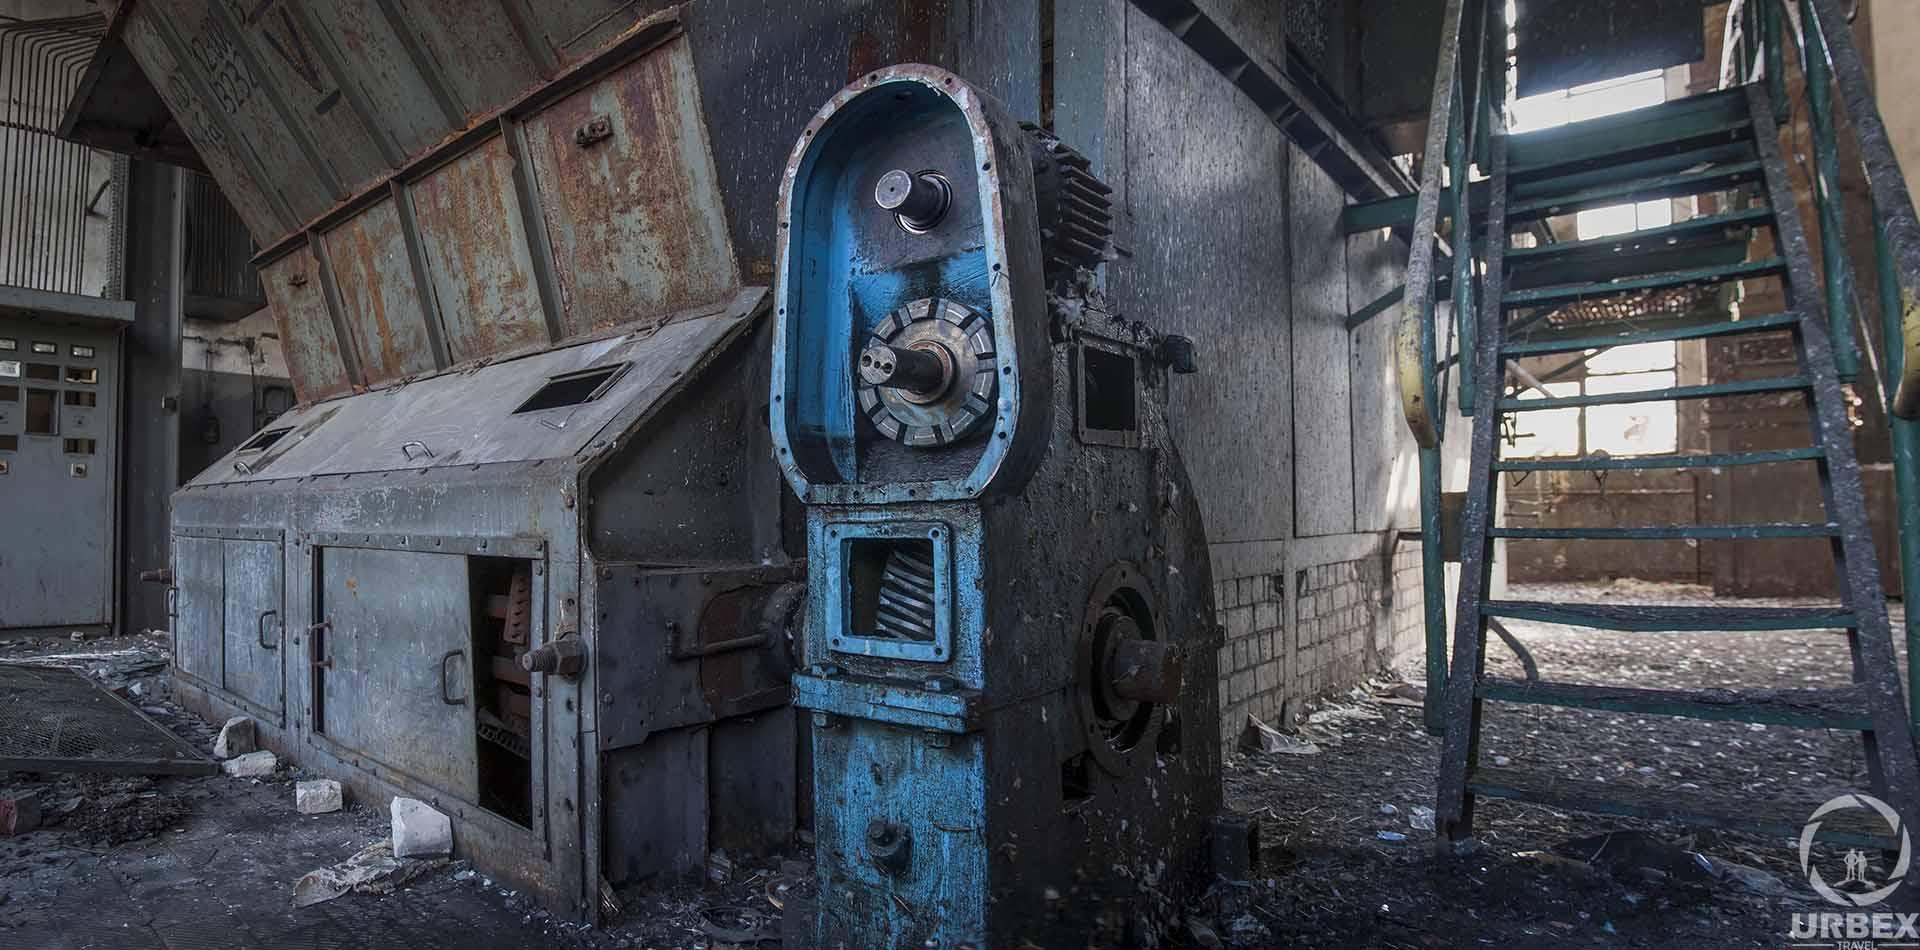 Furnace in Abandoned Boiler Room in Zielonka